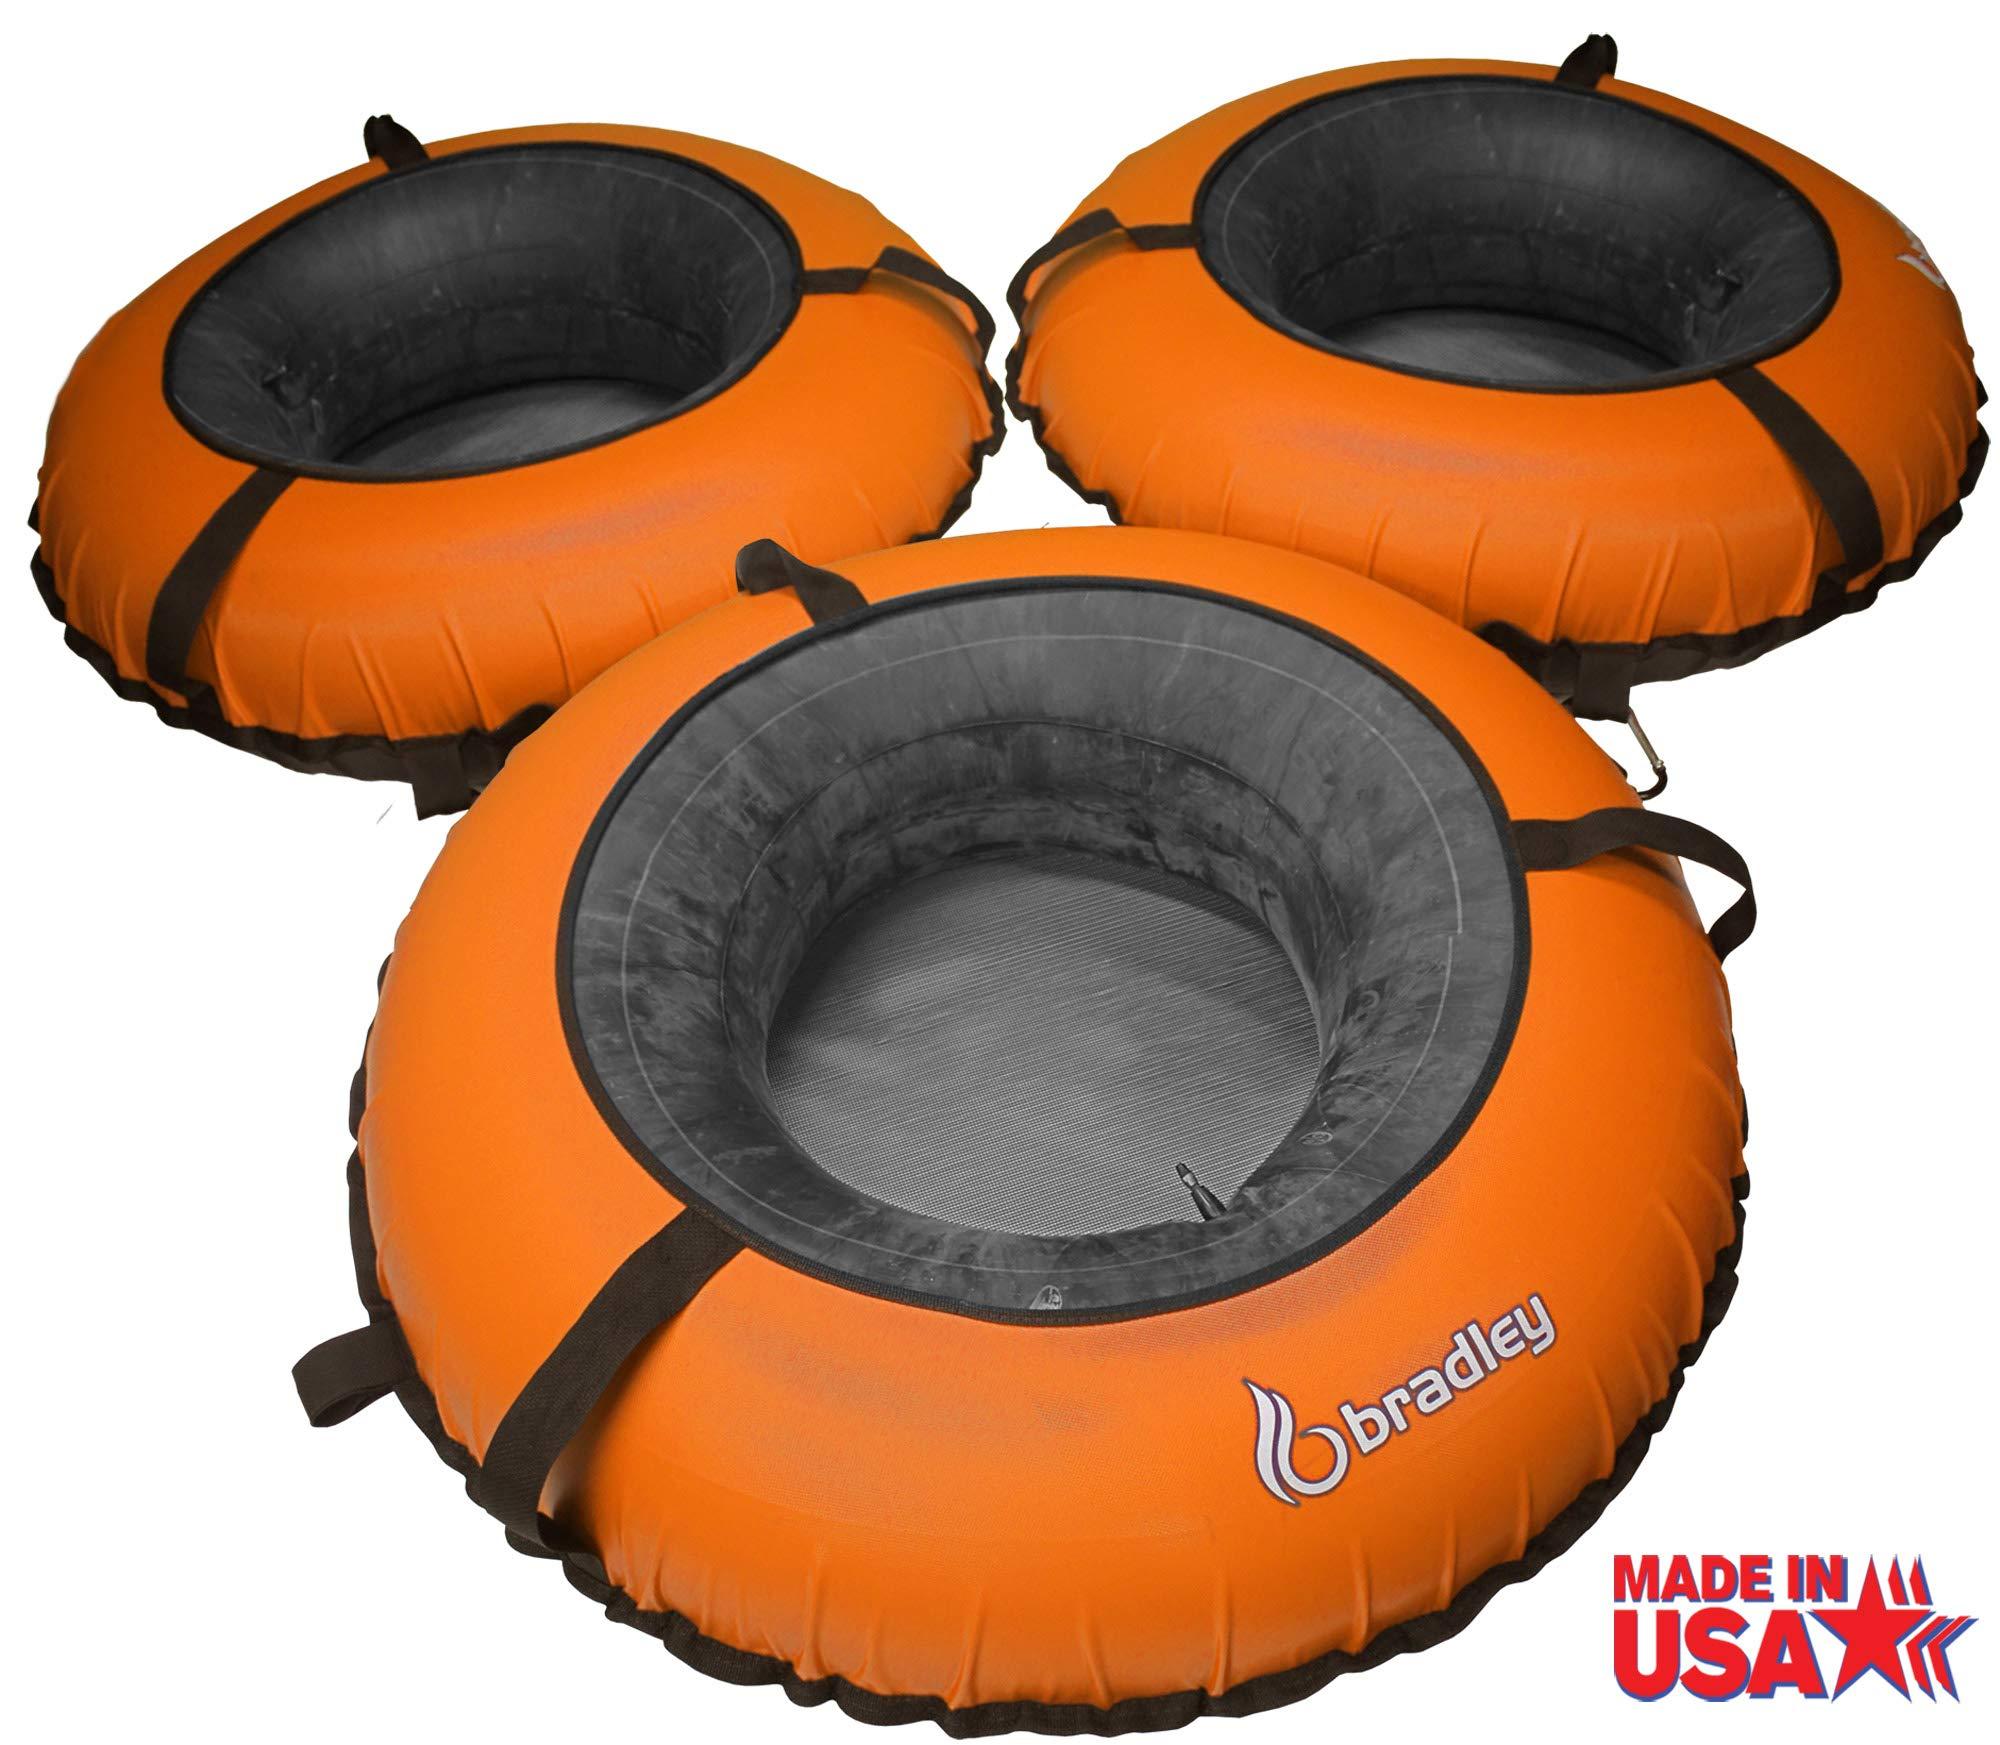 Bradley River Tubes 3 Pack | Heavy Duty Truck Tire Inner Tubes & Cover | Linking River Tubes | Connecting River Run Tube